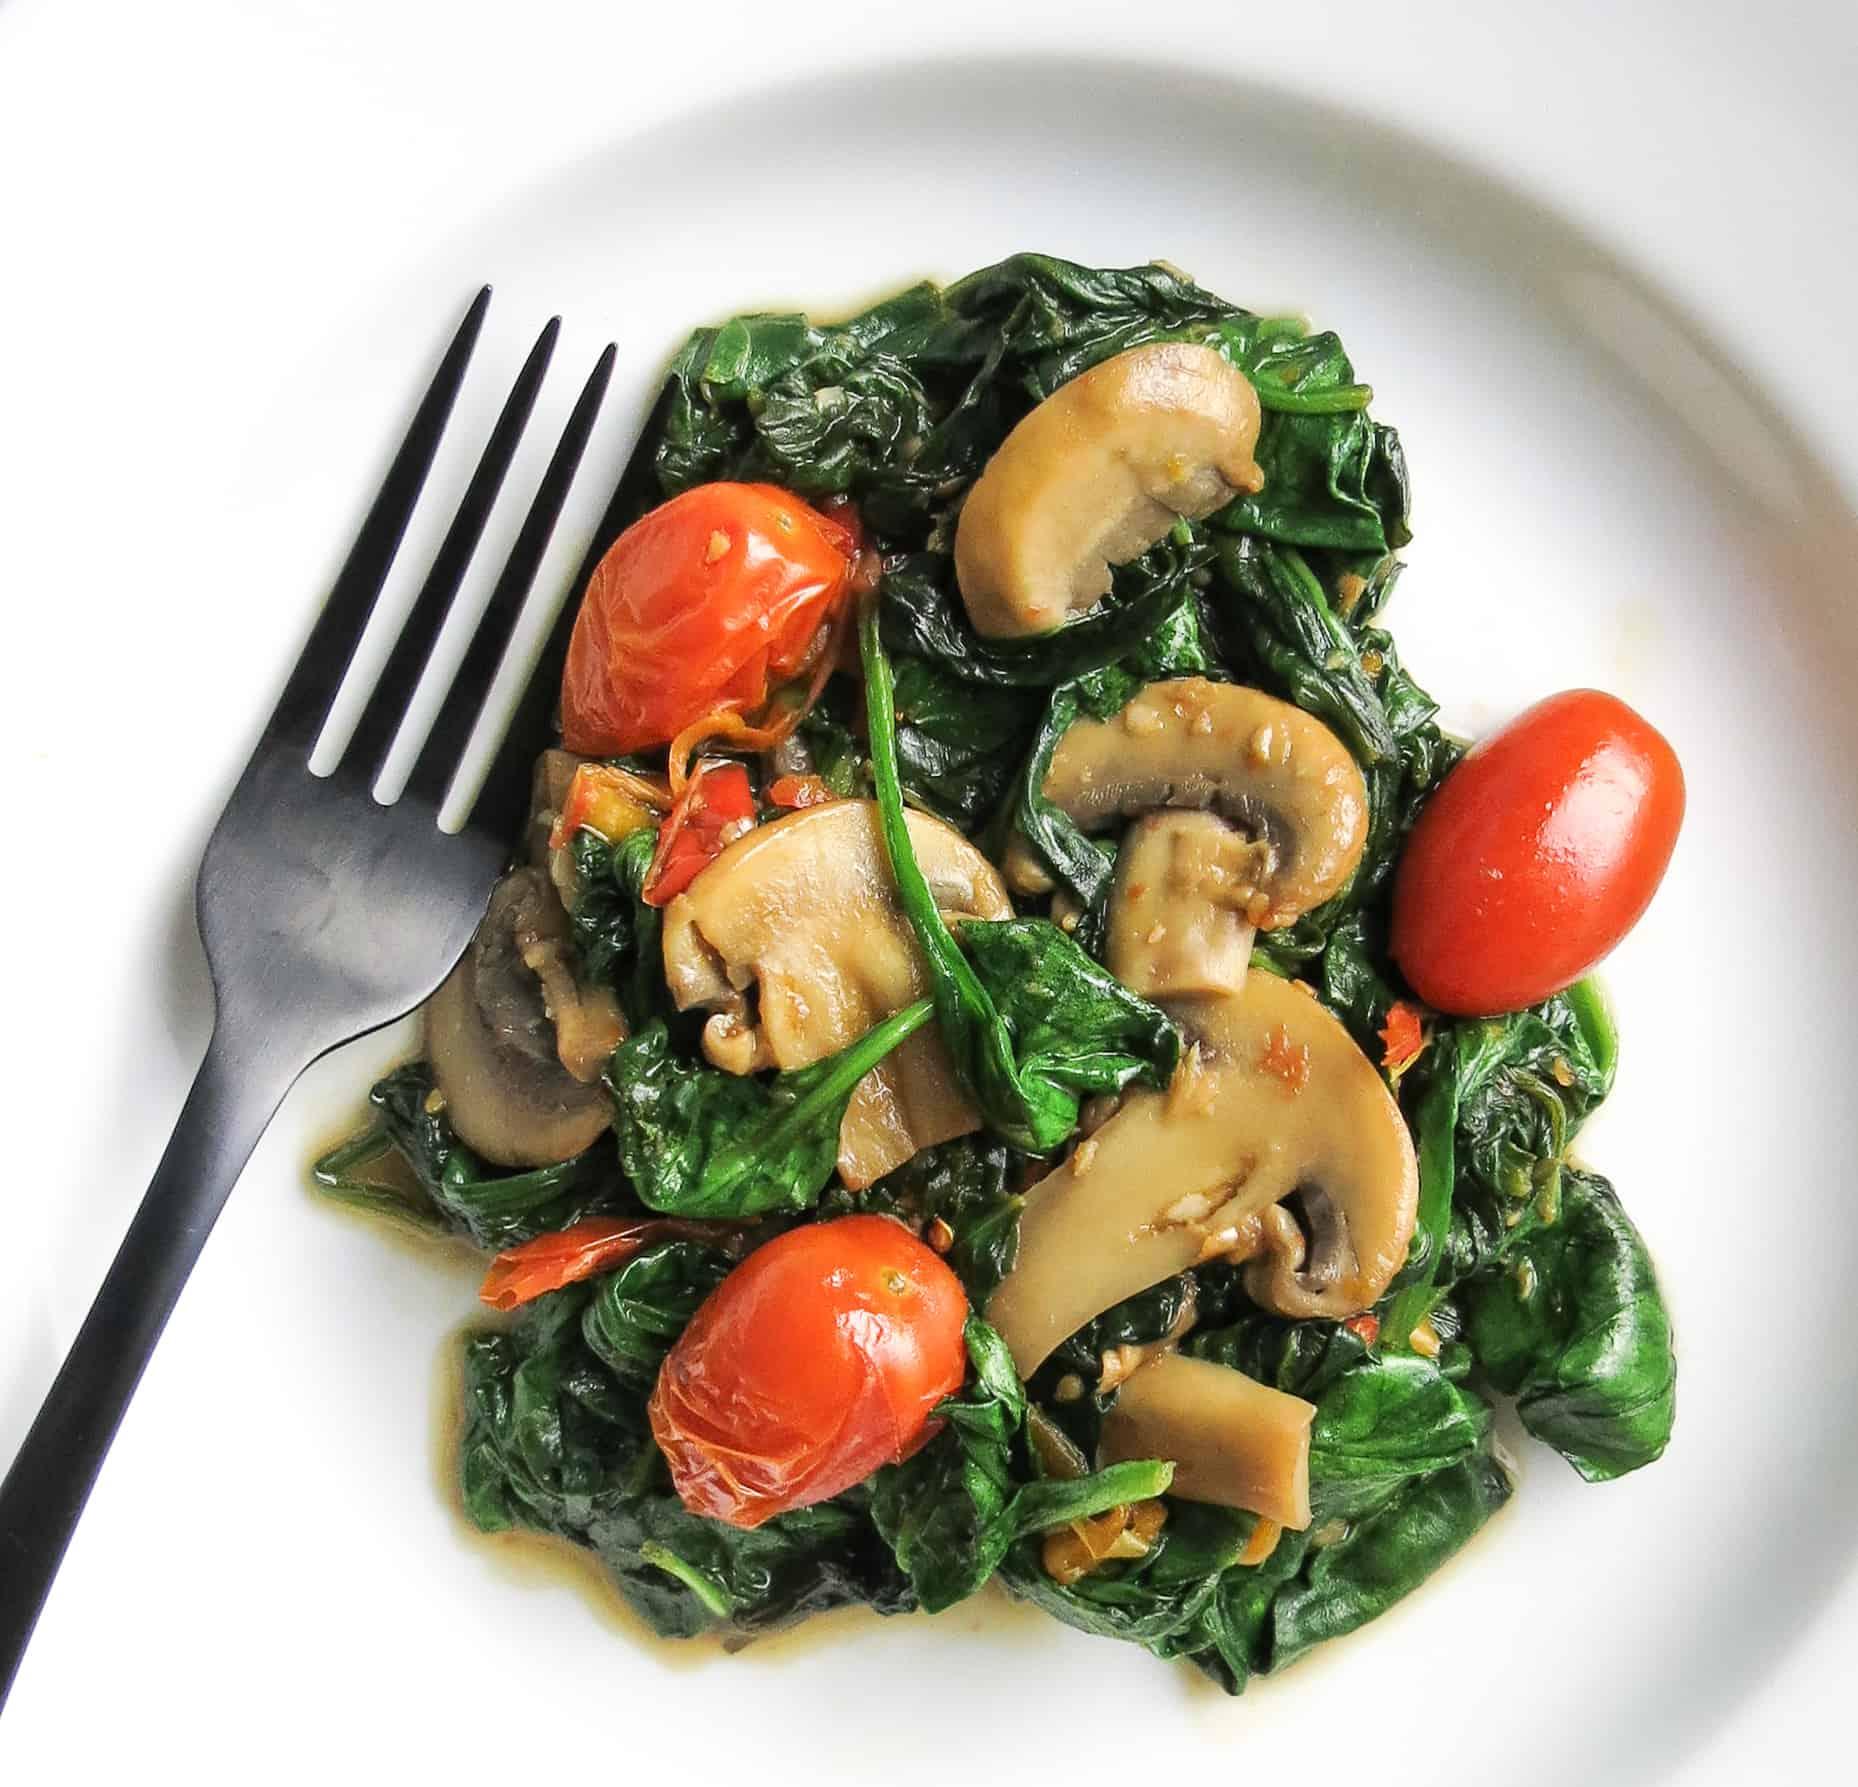 Spinach Medley